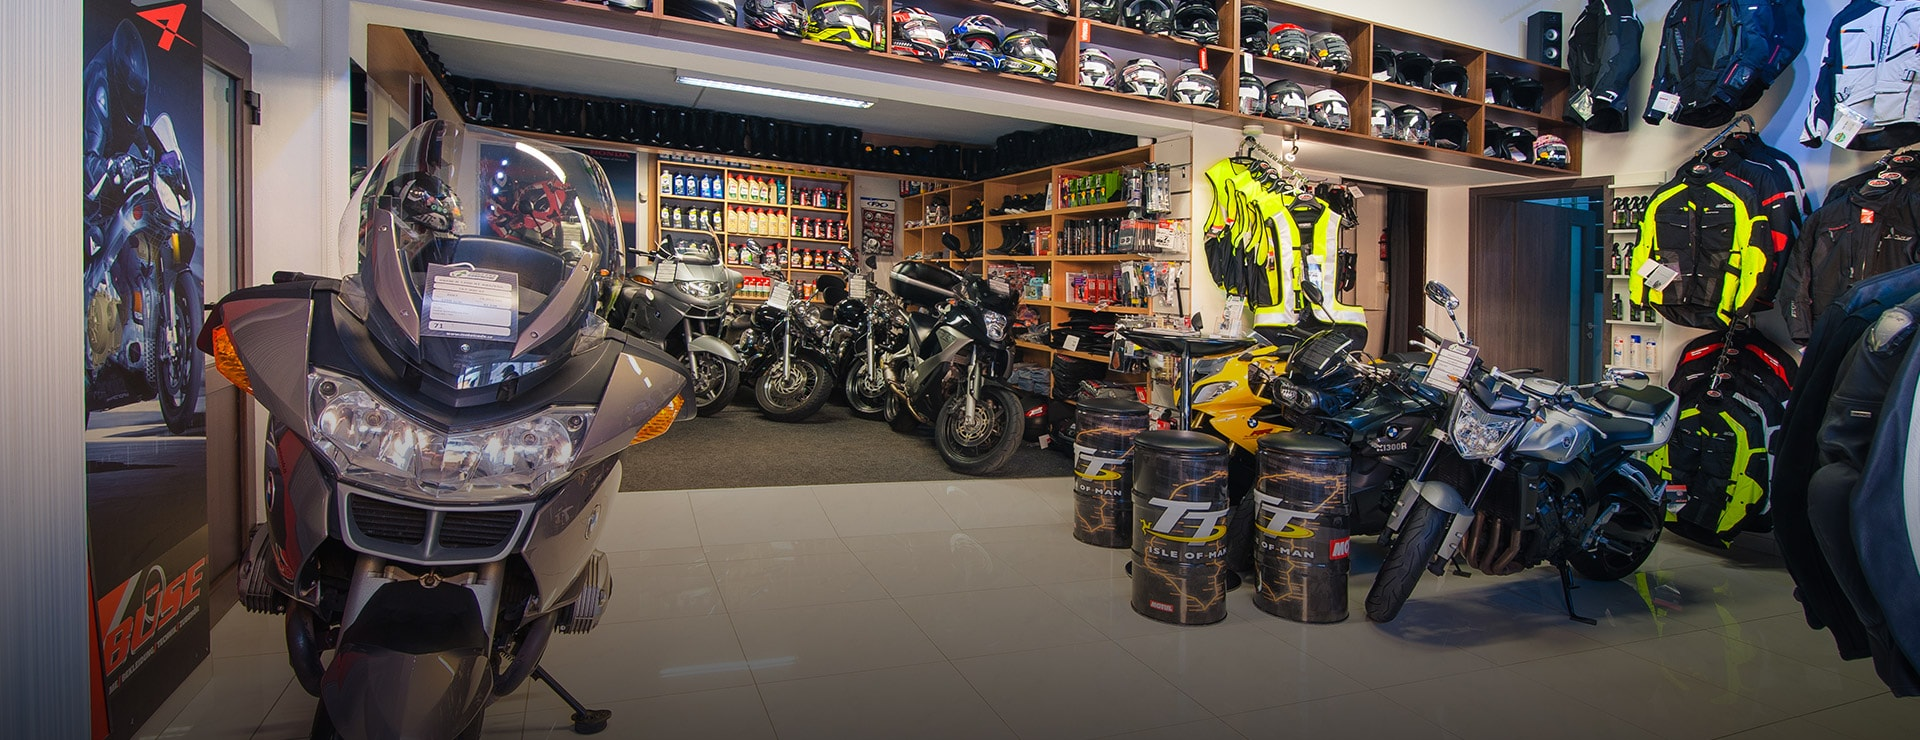 dans motorcycle shop manuals